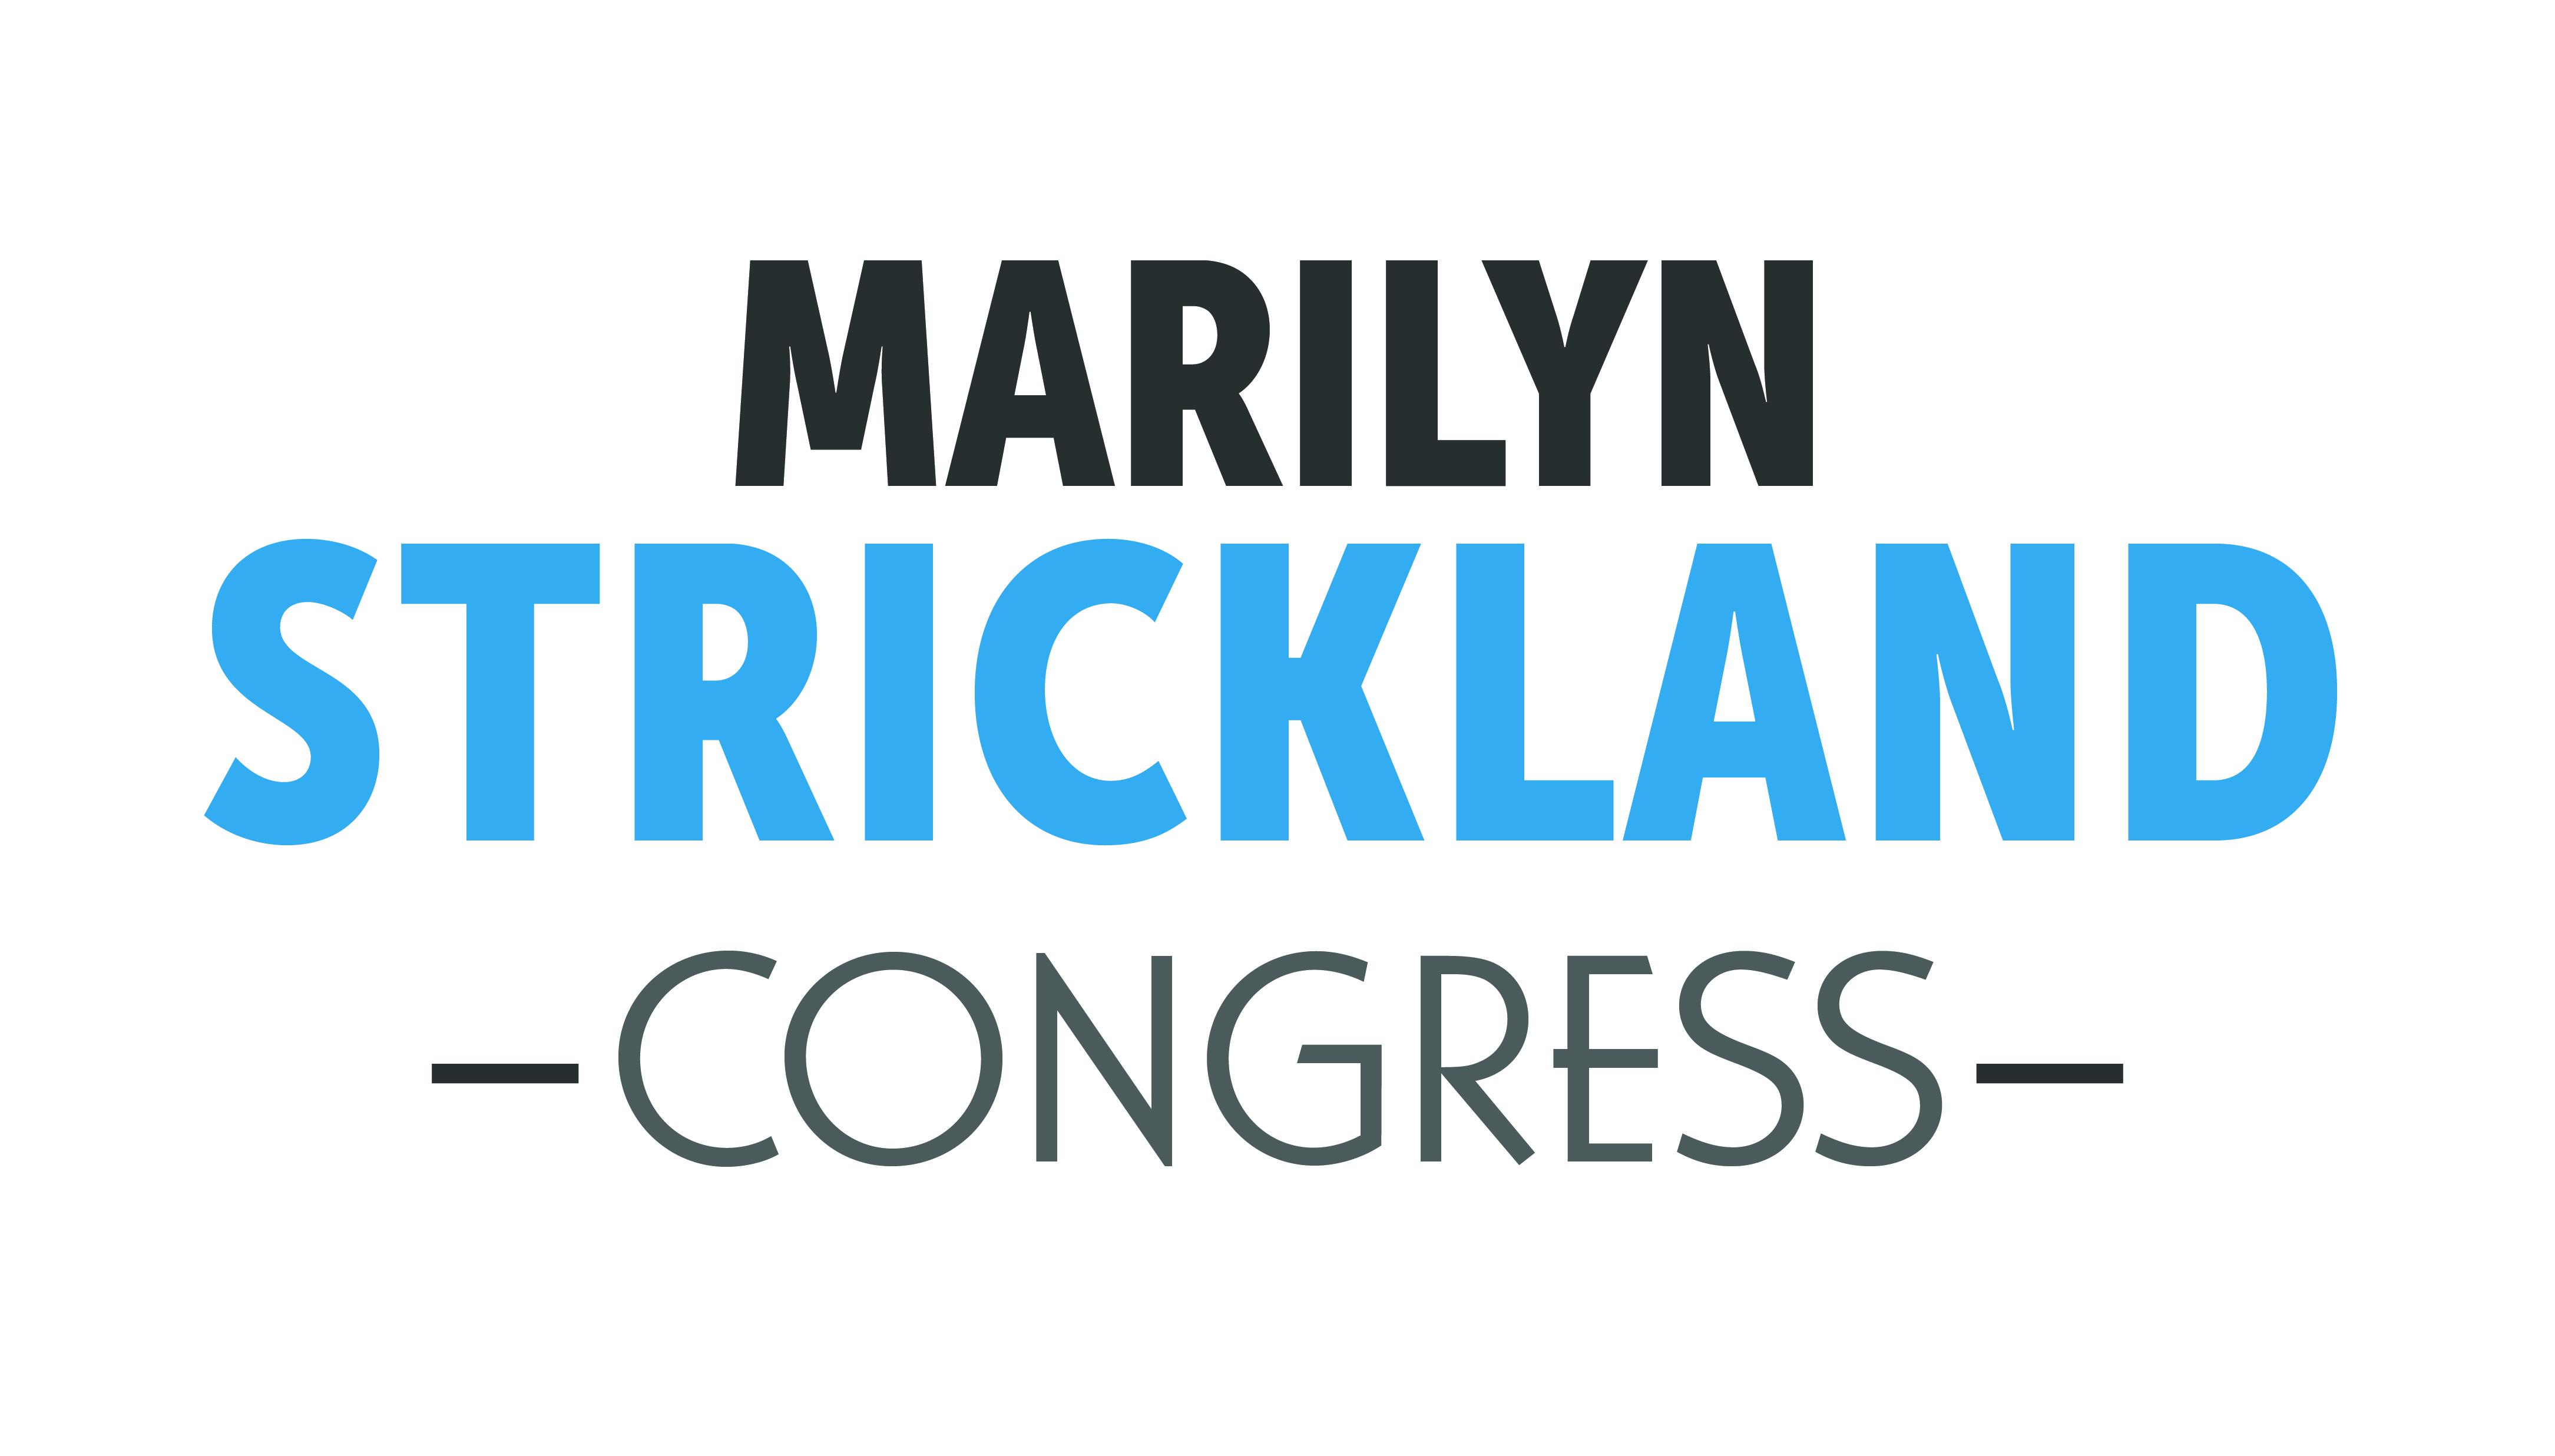 Marilyn Strickland